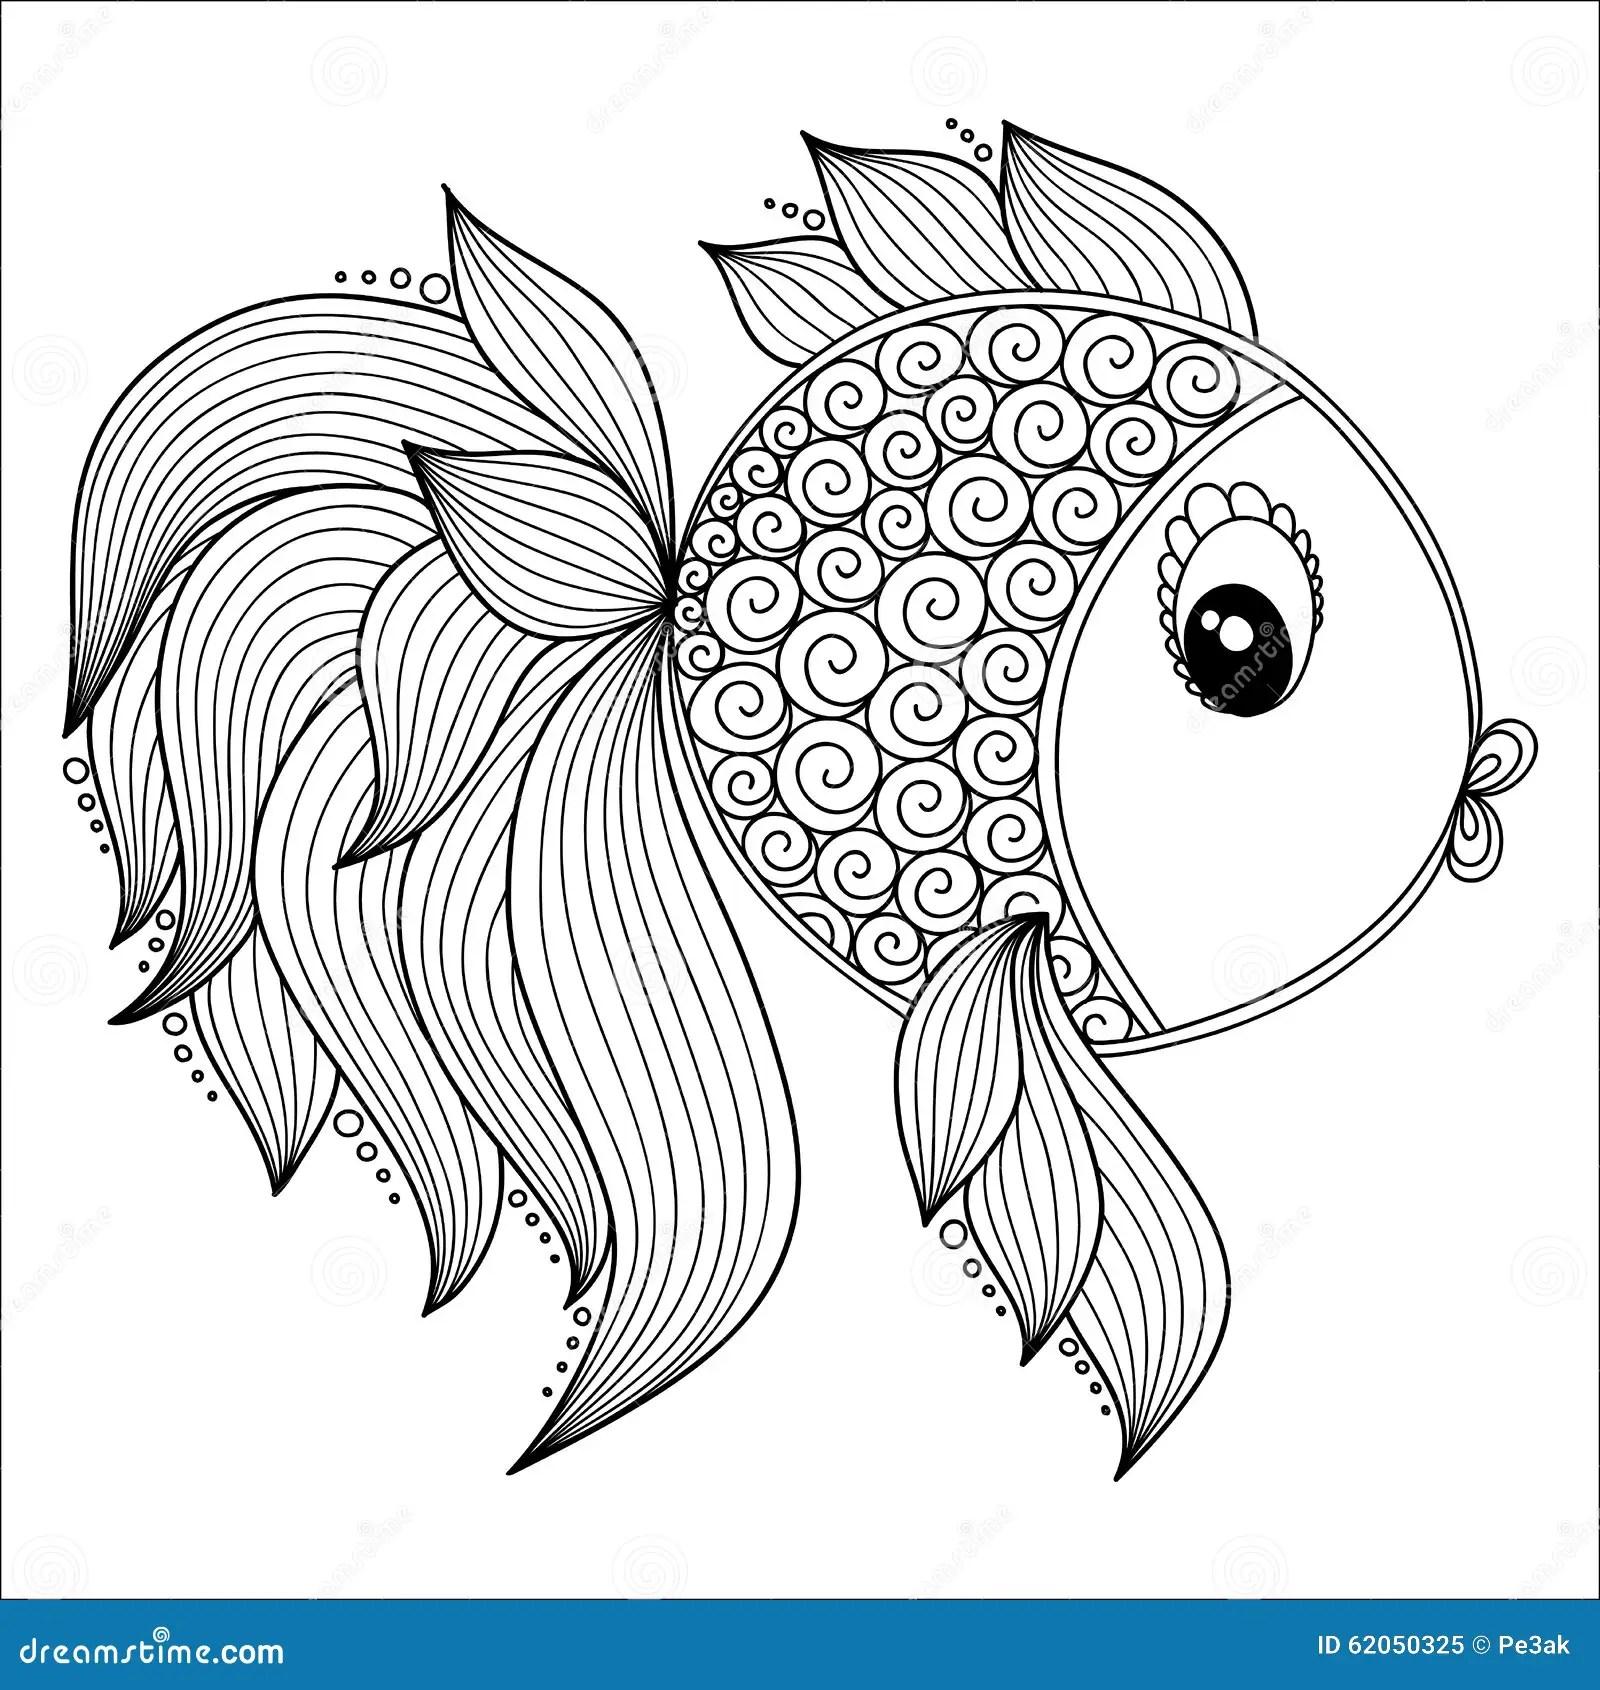 Poissons Mignons Stock Illustrations Vecteurs Amp Clipart